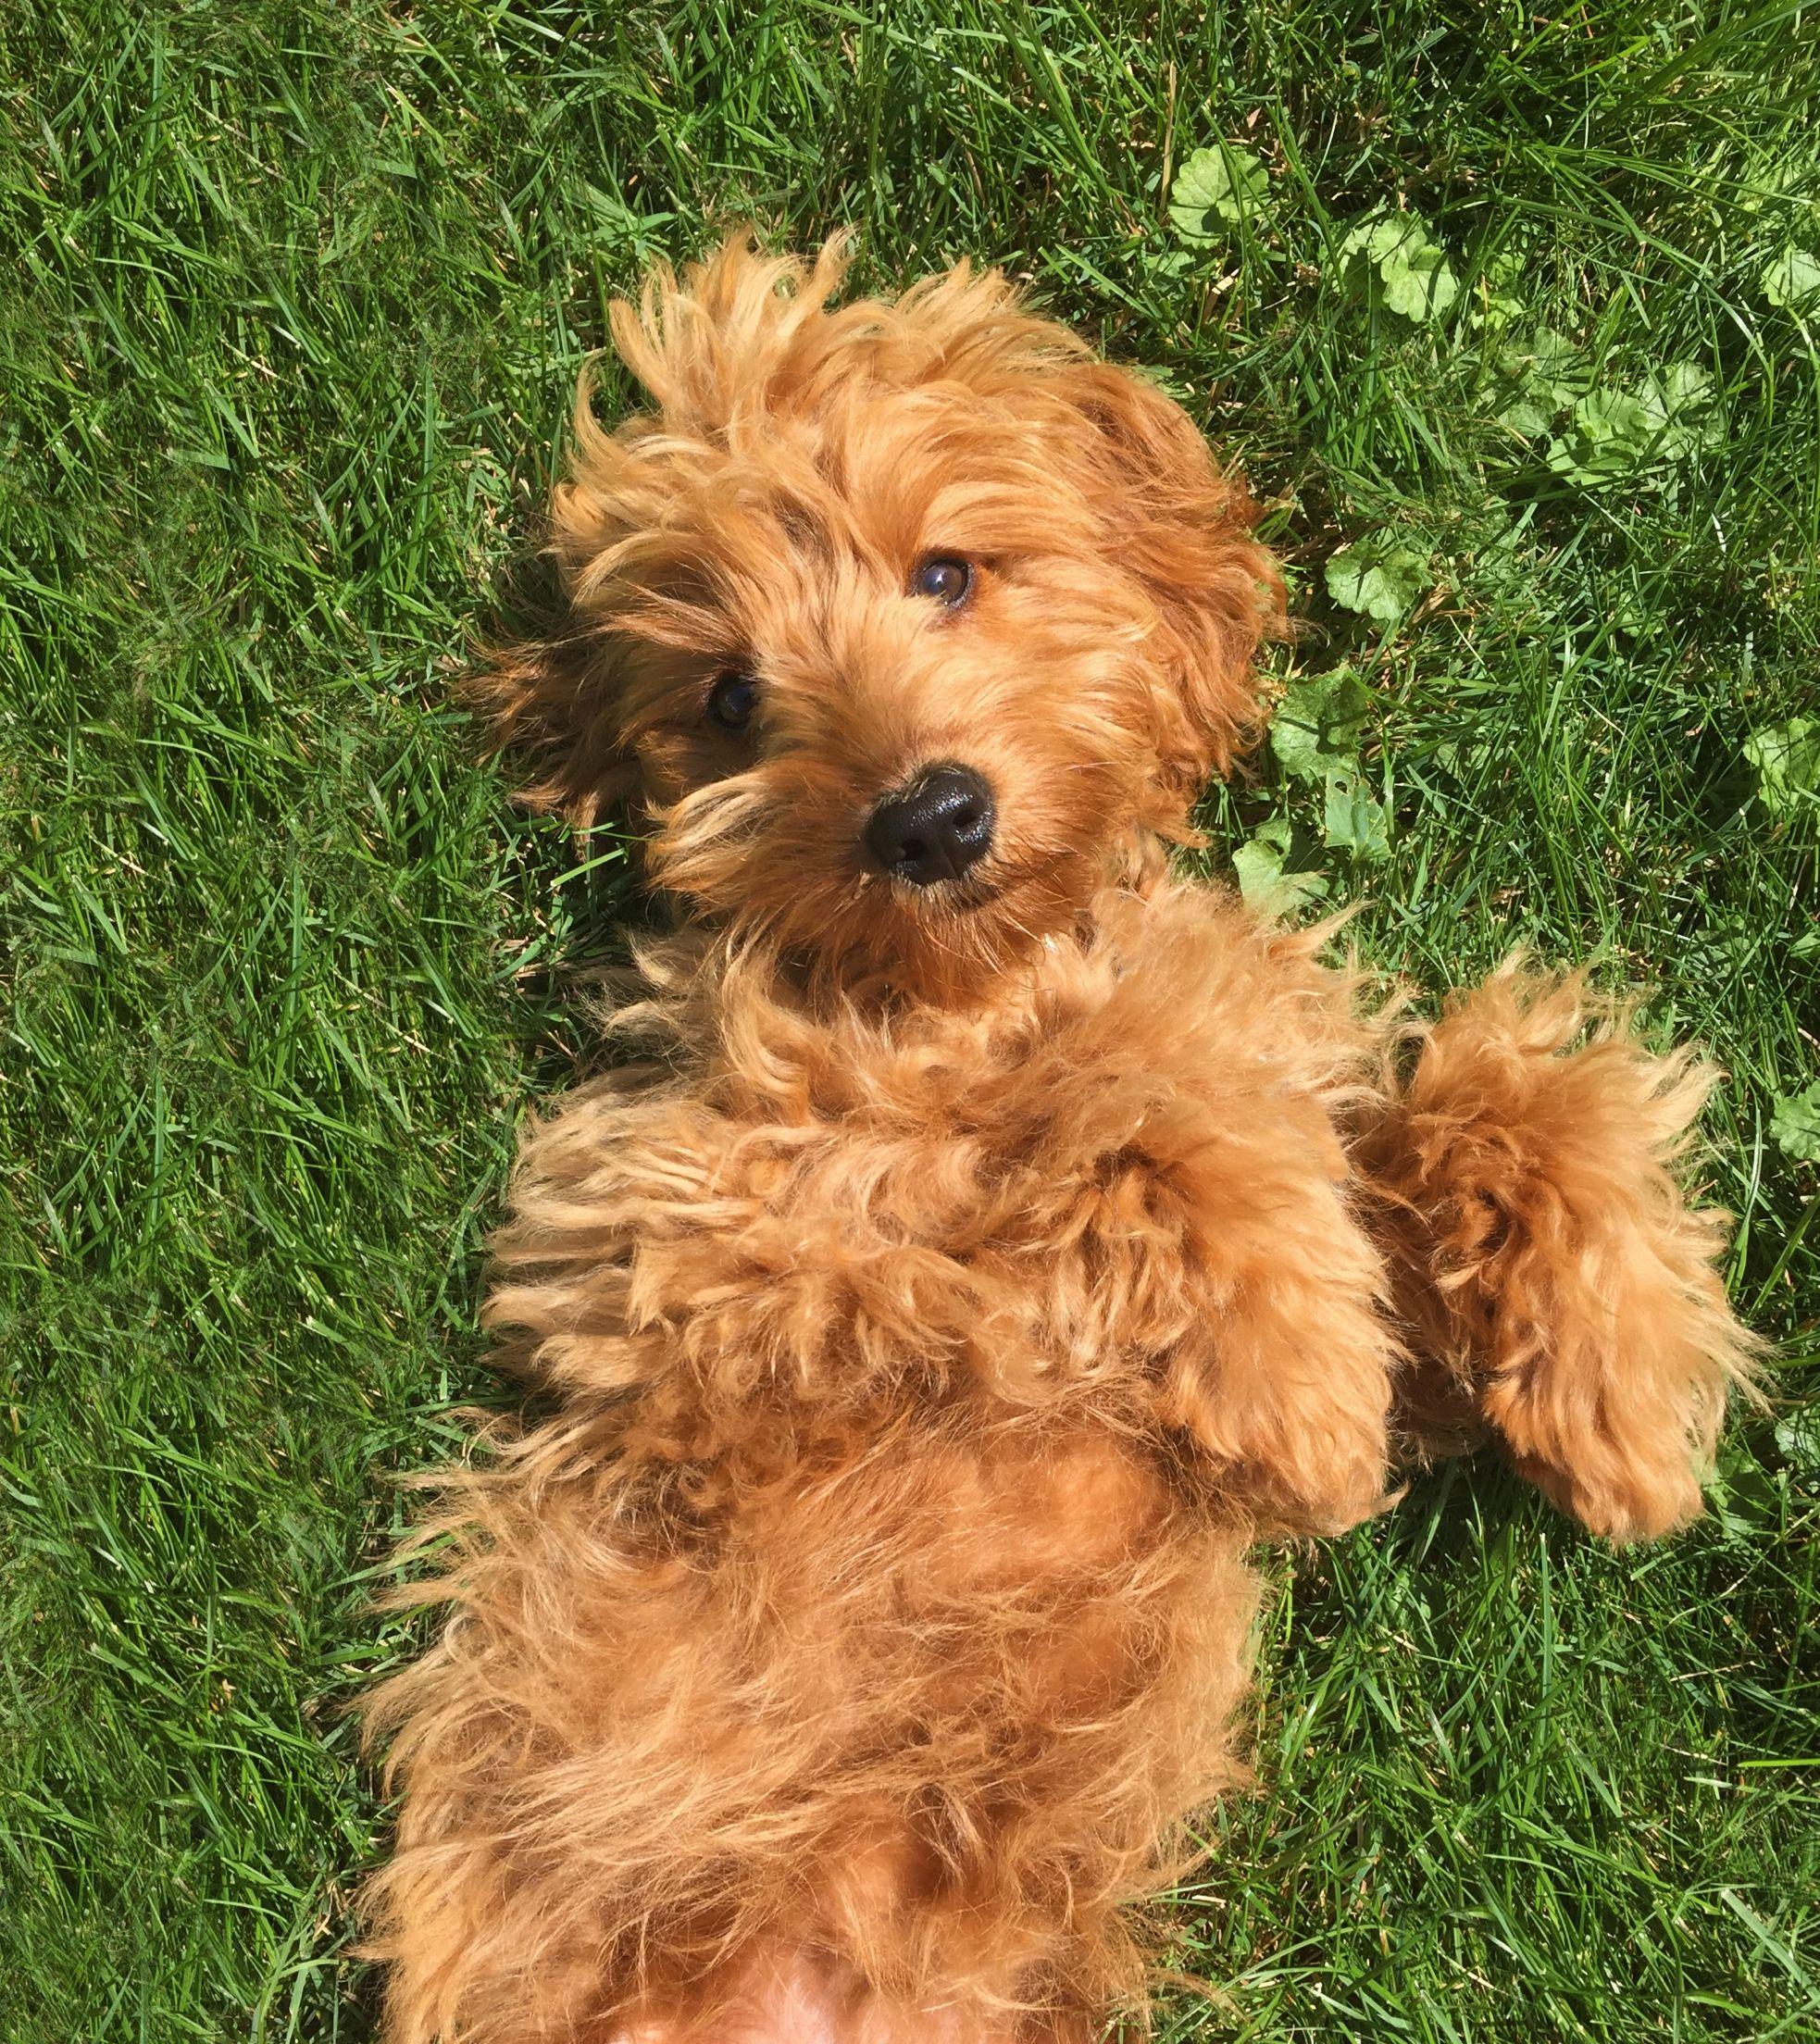 Petite Goldendoodle Puppy So Adorable Xo Poodle Mix Dogs